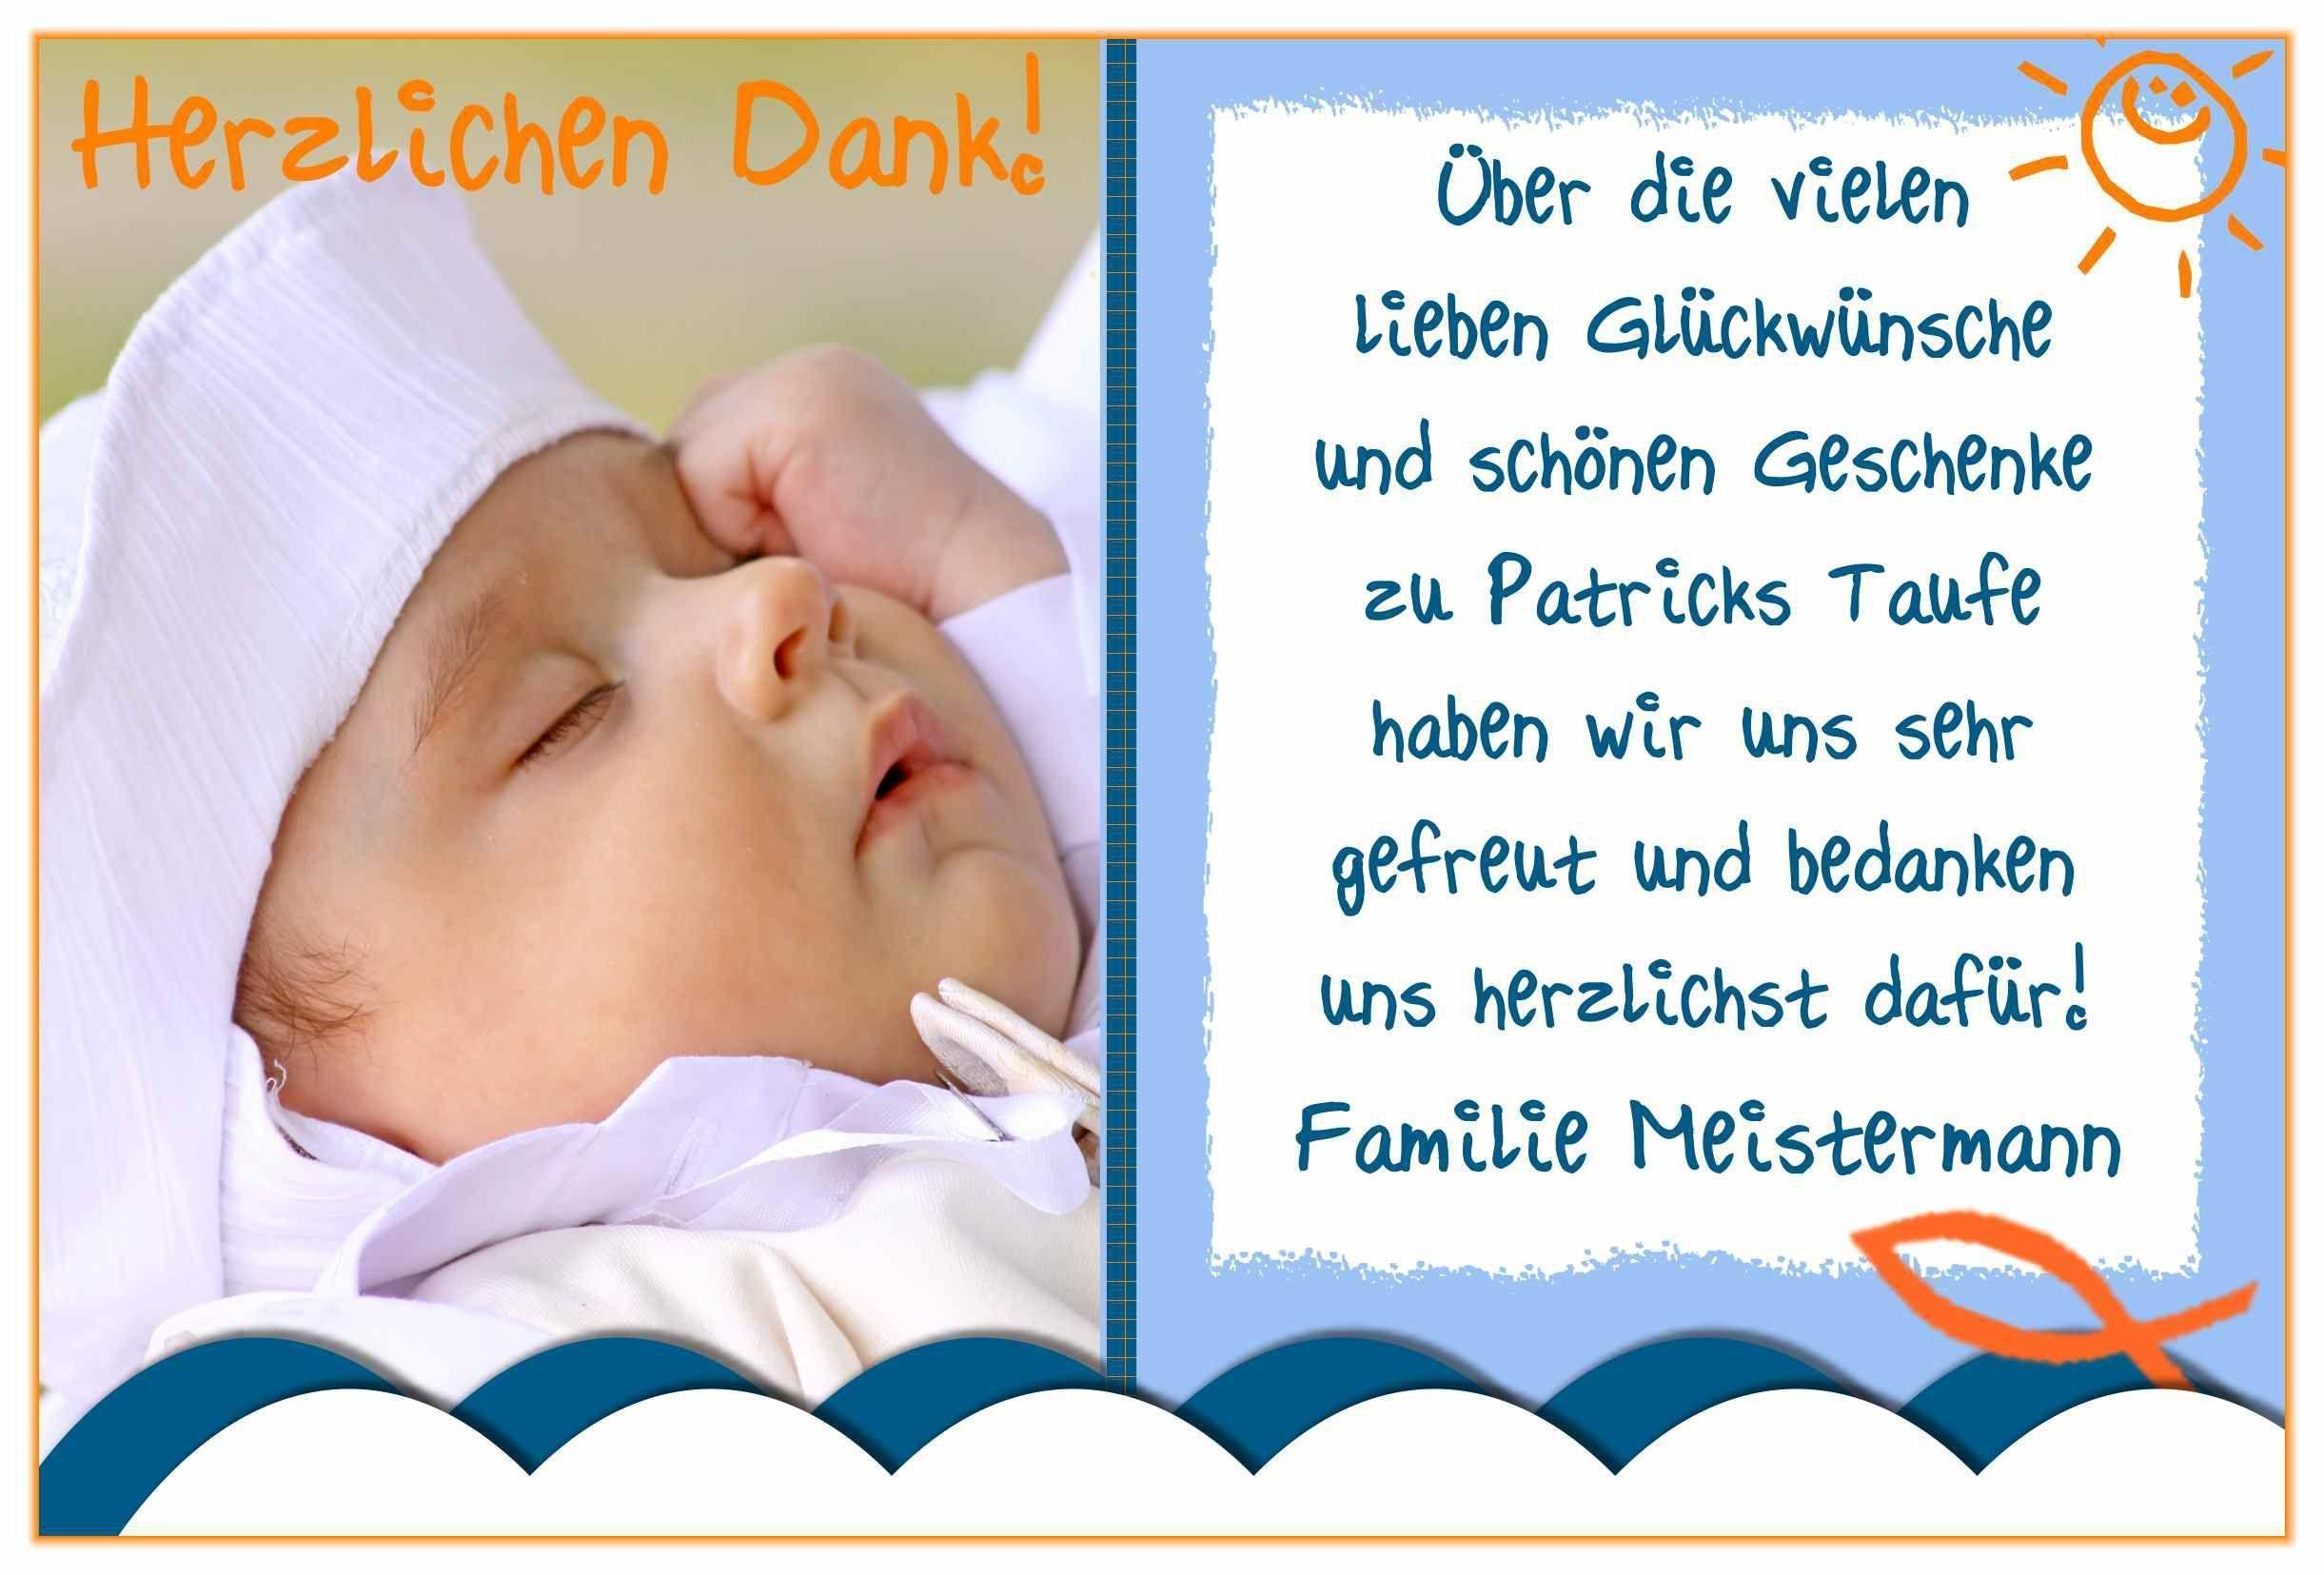 Einladungskarten Taufe Einladungskarten Taufe Zum: Einladungskarten Geburtstag : Einladungskarten Taufe